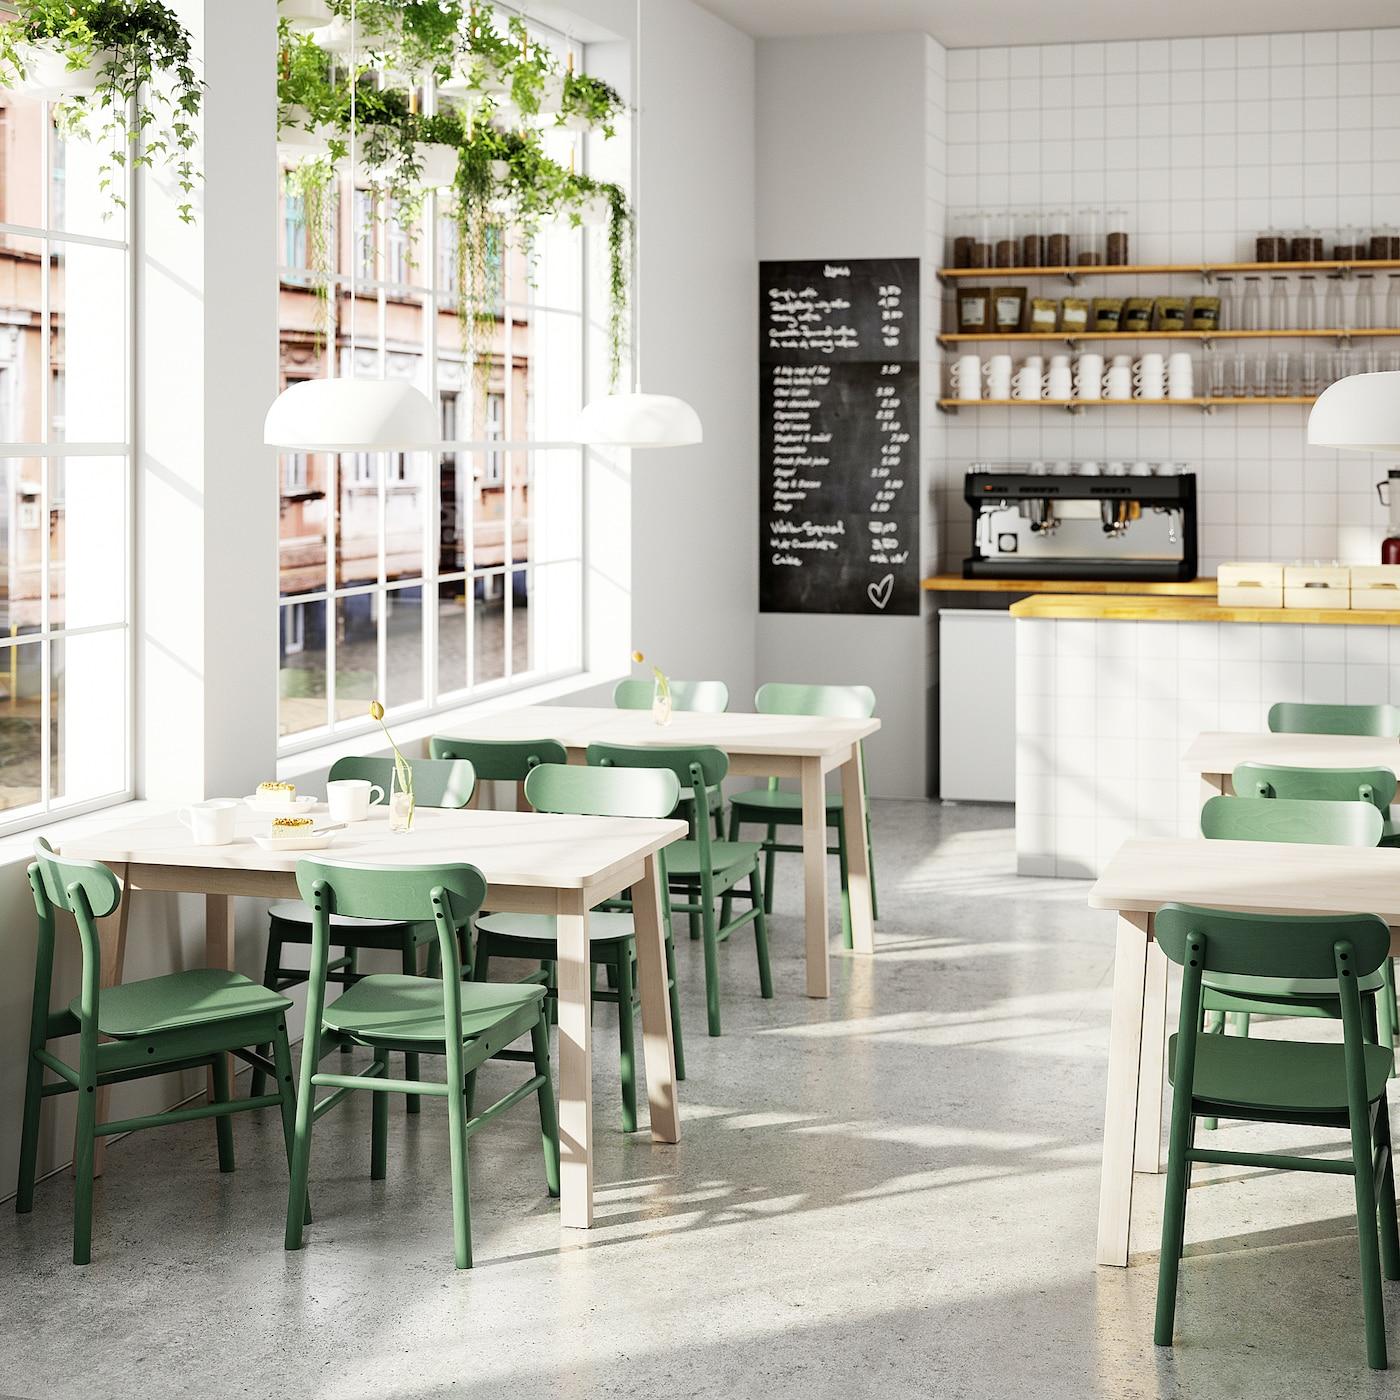 NORRÅKER RÖNNINGE Tavolo e 4 sedie betulla, verde 125x74 cm